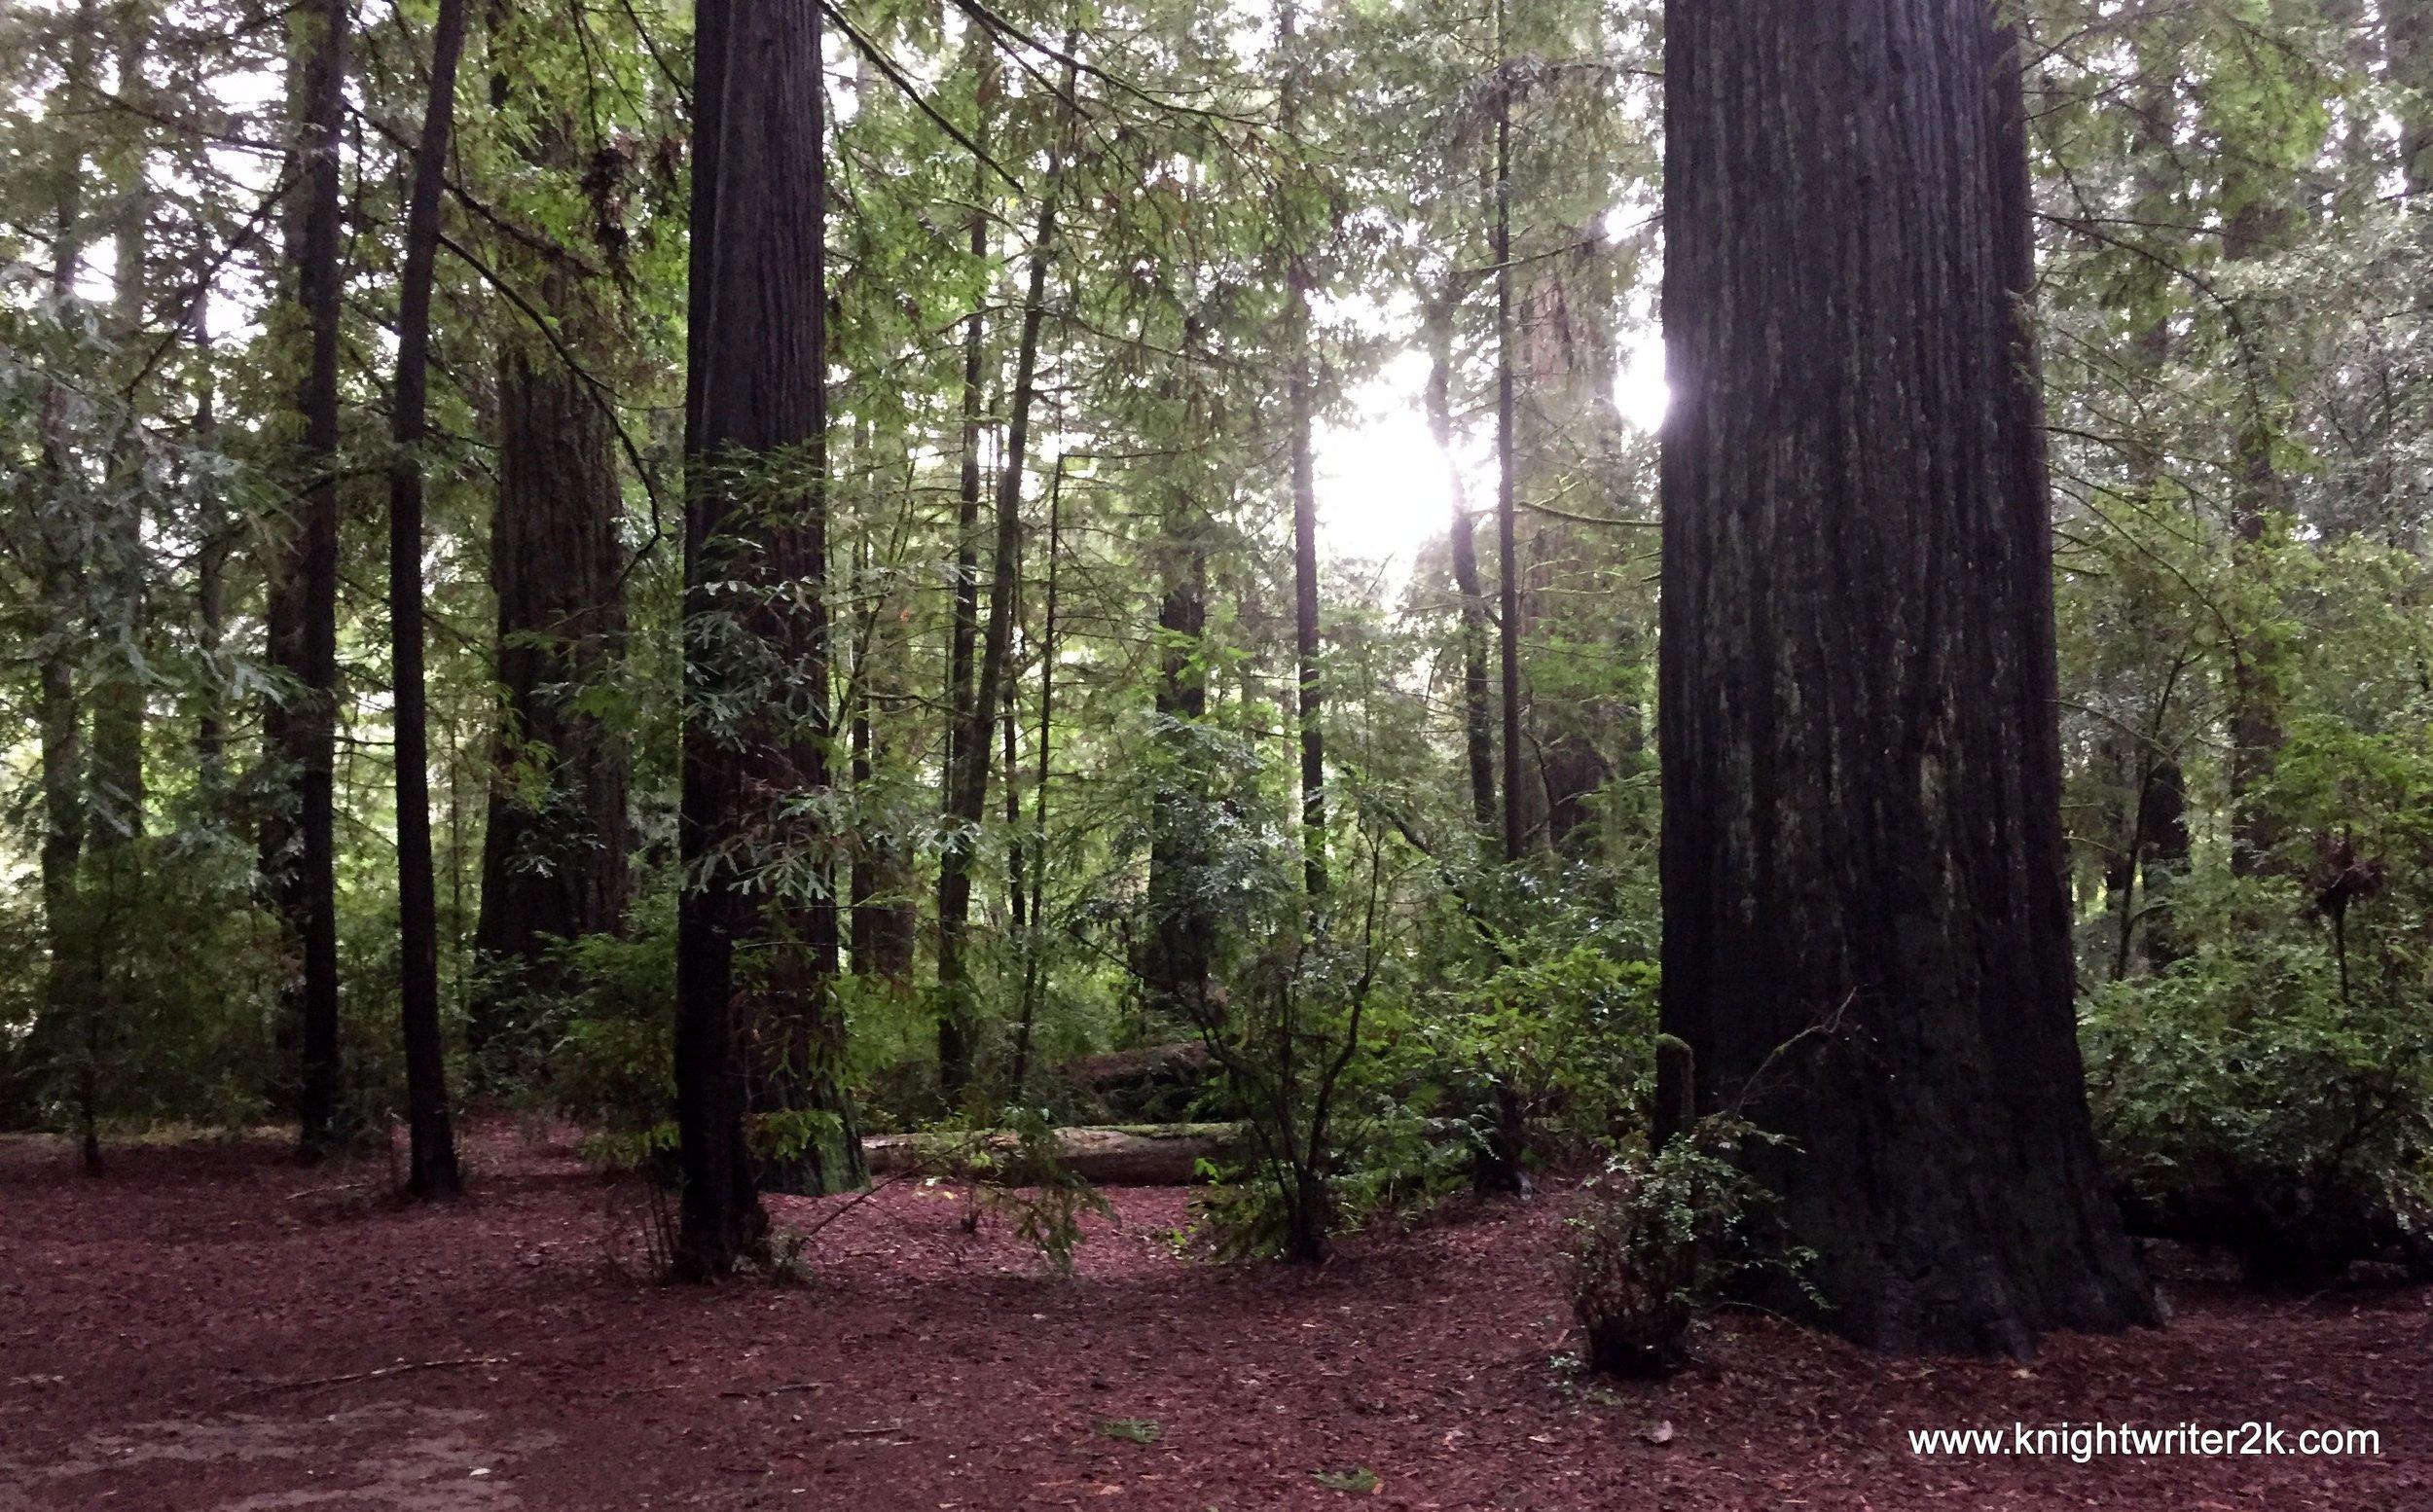 The redwoods of California. Amazing.